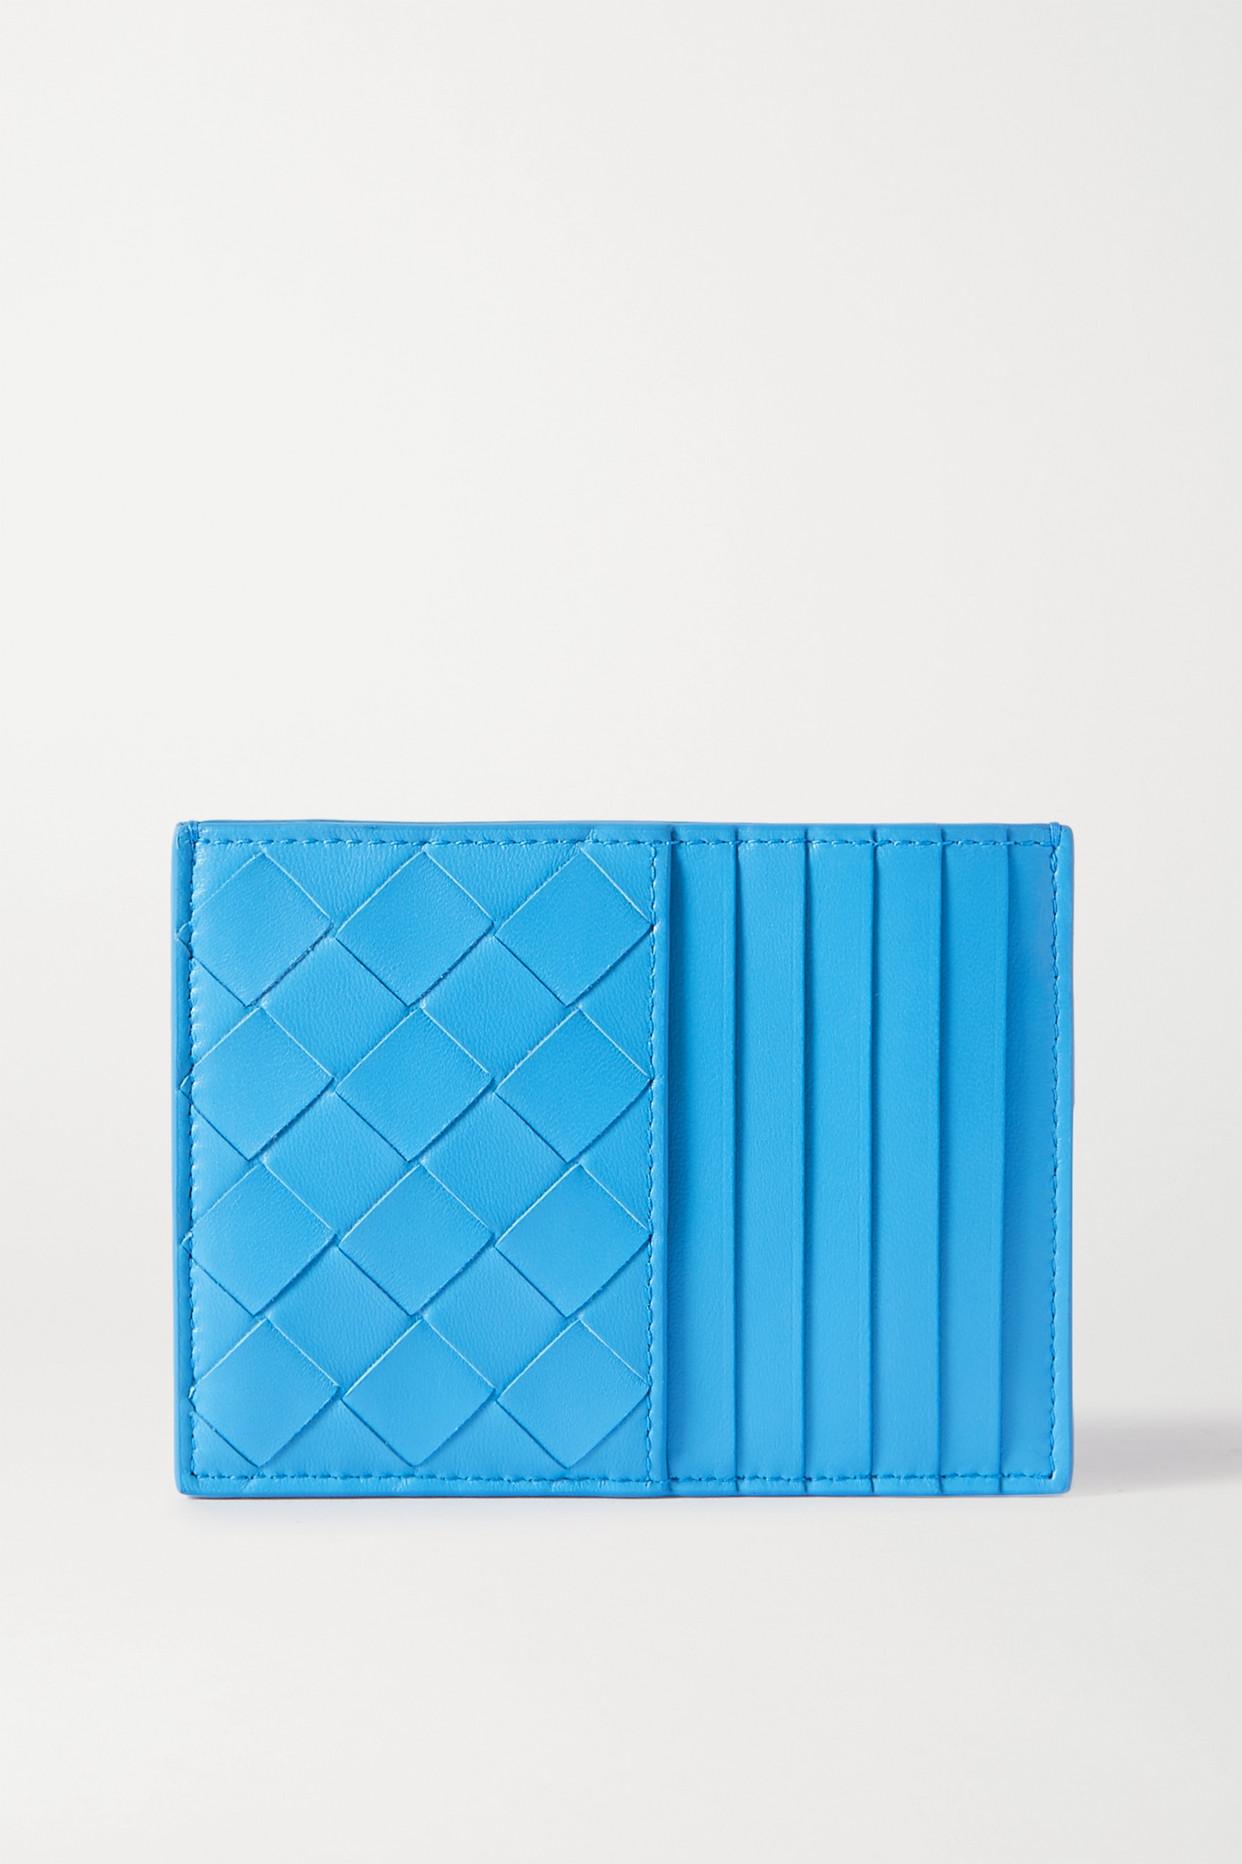 BOTTEGA VENETA - Intrecciato 皮革卡夹 - 蓝色 - one size